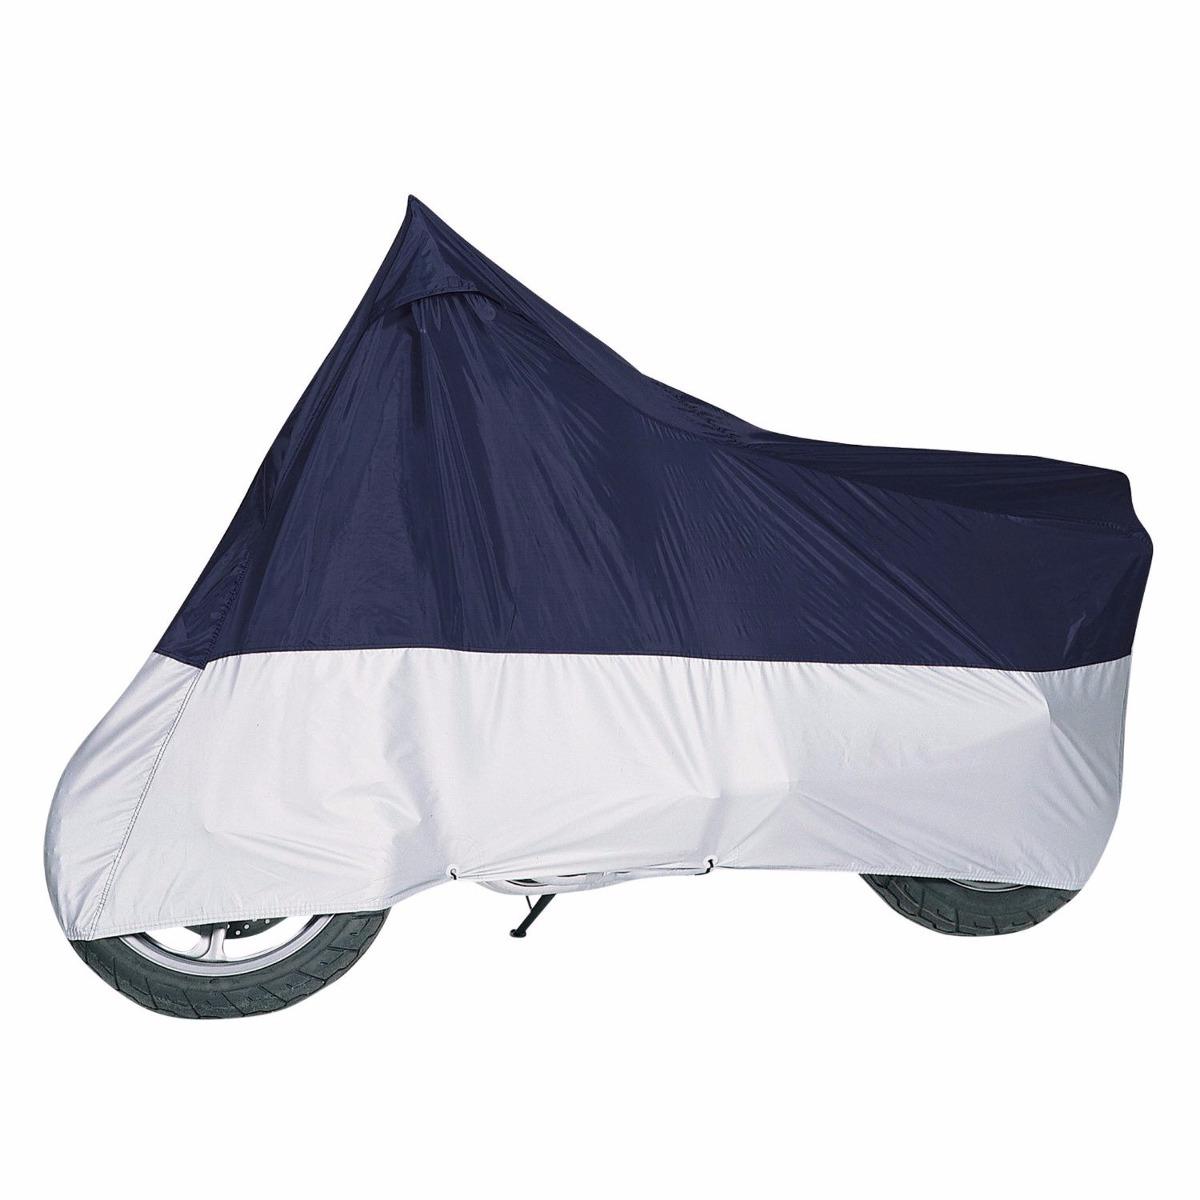 f9c9c4cc47e pack6 funda lona cubre moto cobertor protector/ pmayorista. Cargando zoom.